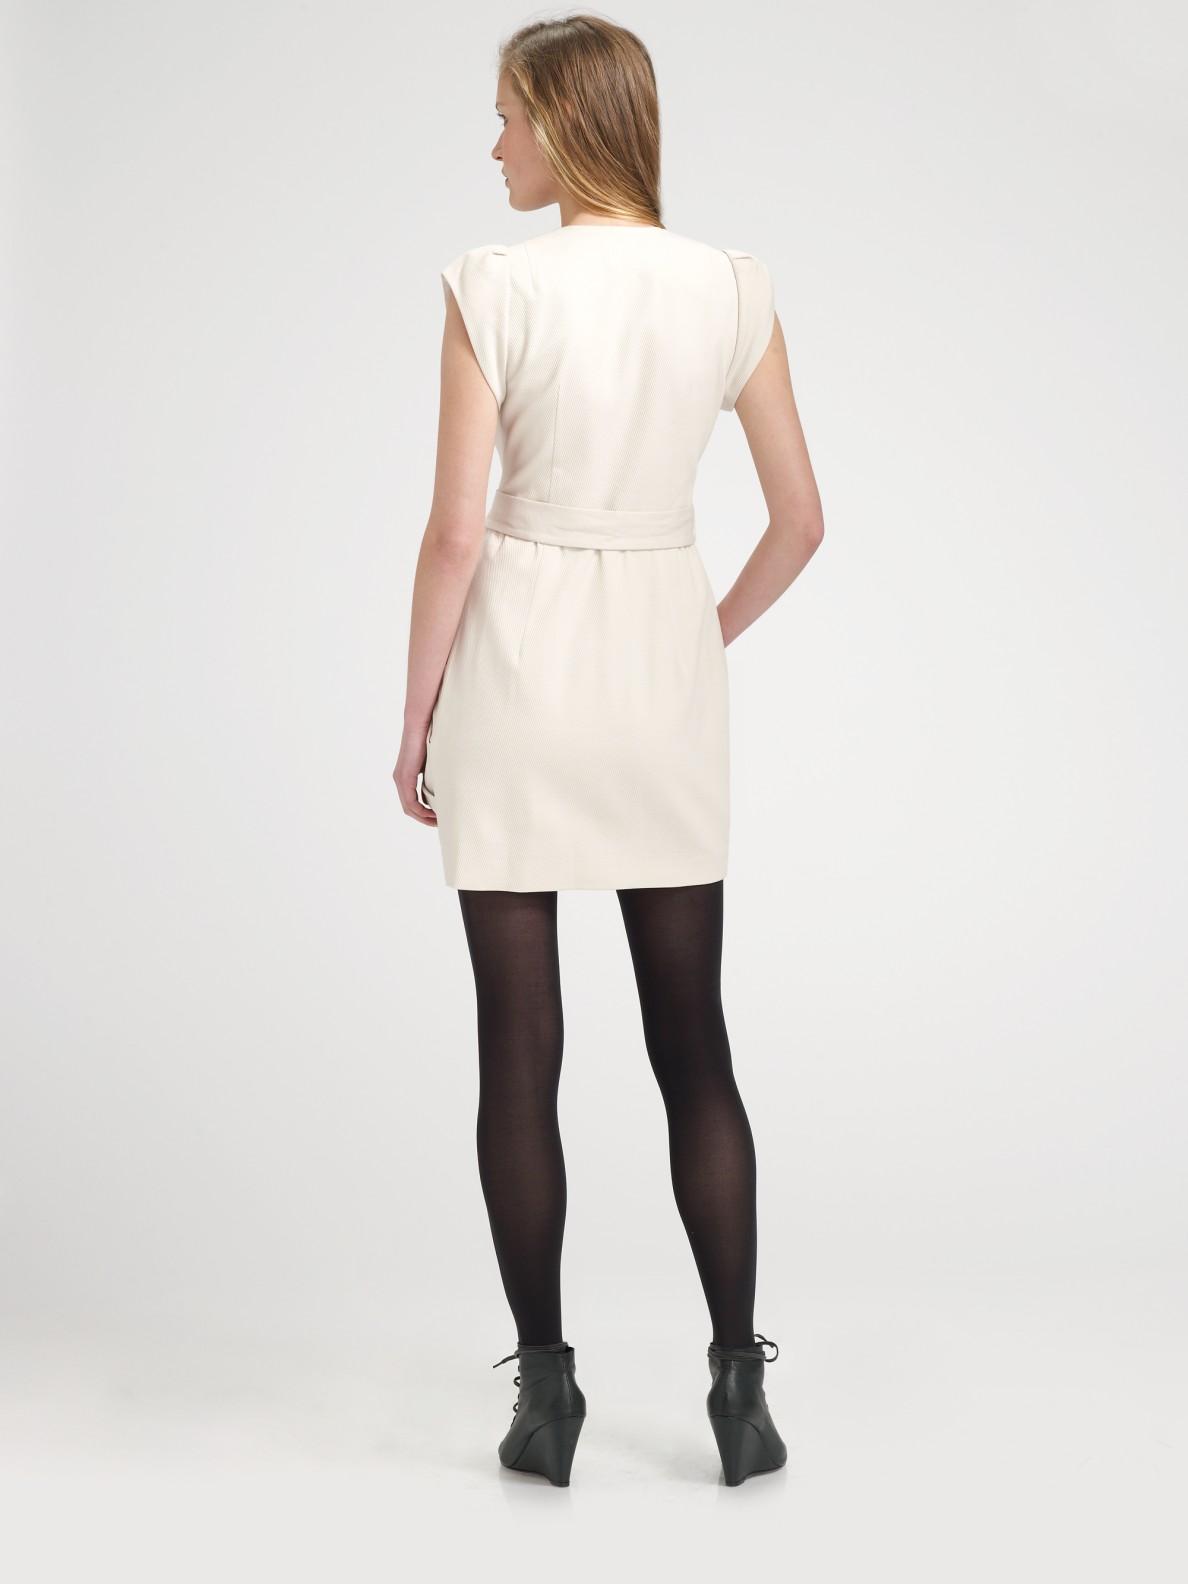 Lyst - Nanette Lepore Casino Royale Dress in Natural